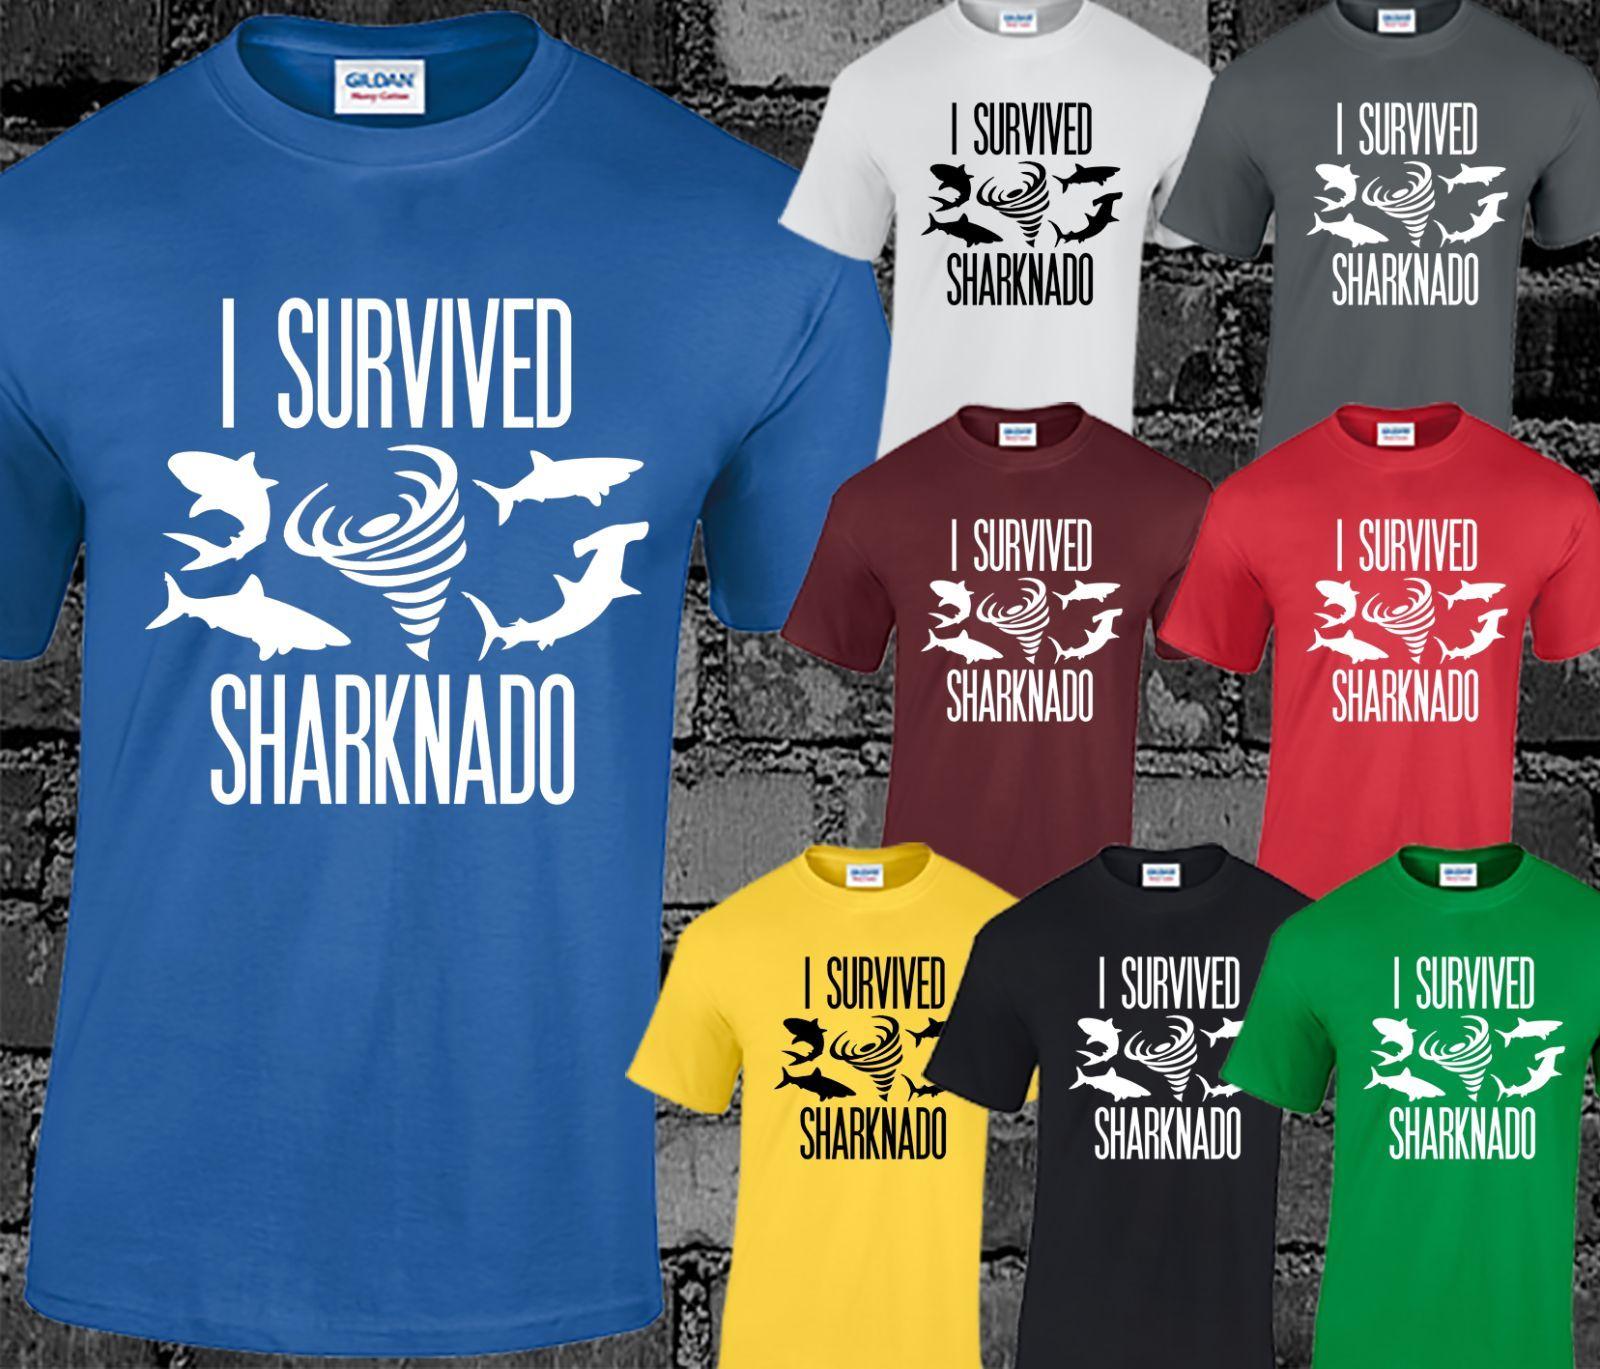 I Survived Sharknado Mens T Shirt Movie Film Cult Sci-fi Funny Print Slogan CoolCool Casual pride t shirt men Unisex New Fashion